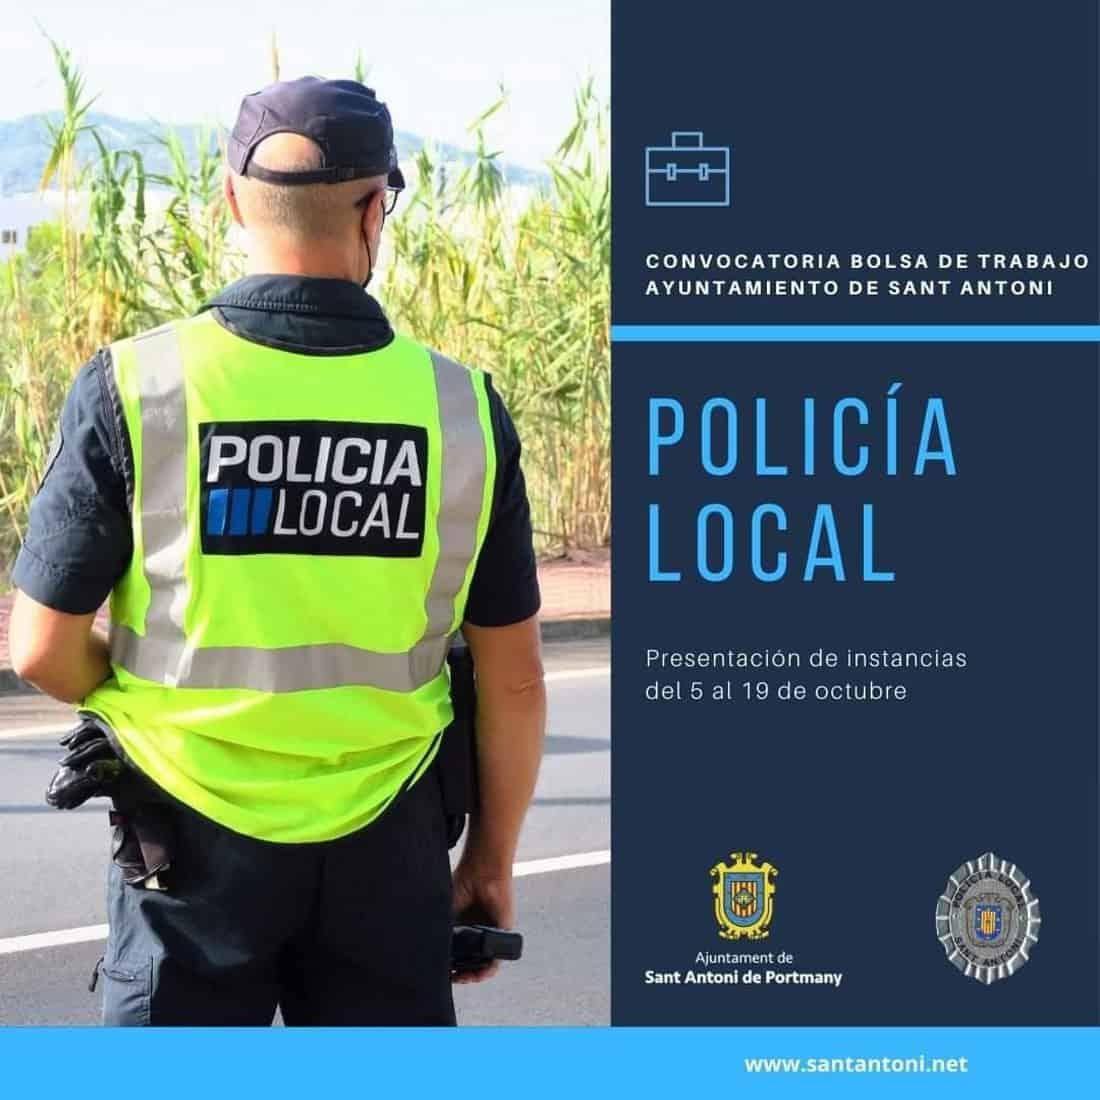 convocatoria-bolsa-de-trabajo-policia-local-san-antonio-ibiza-2020-welcometoibiza